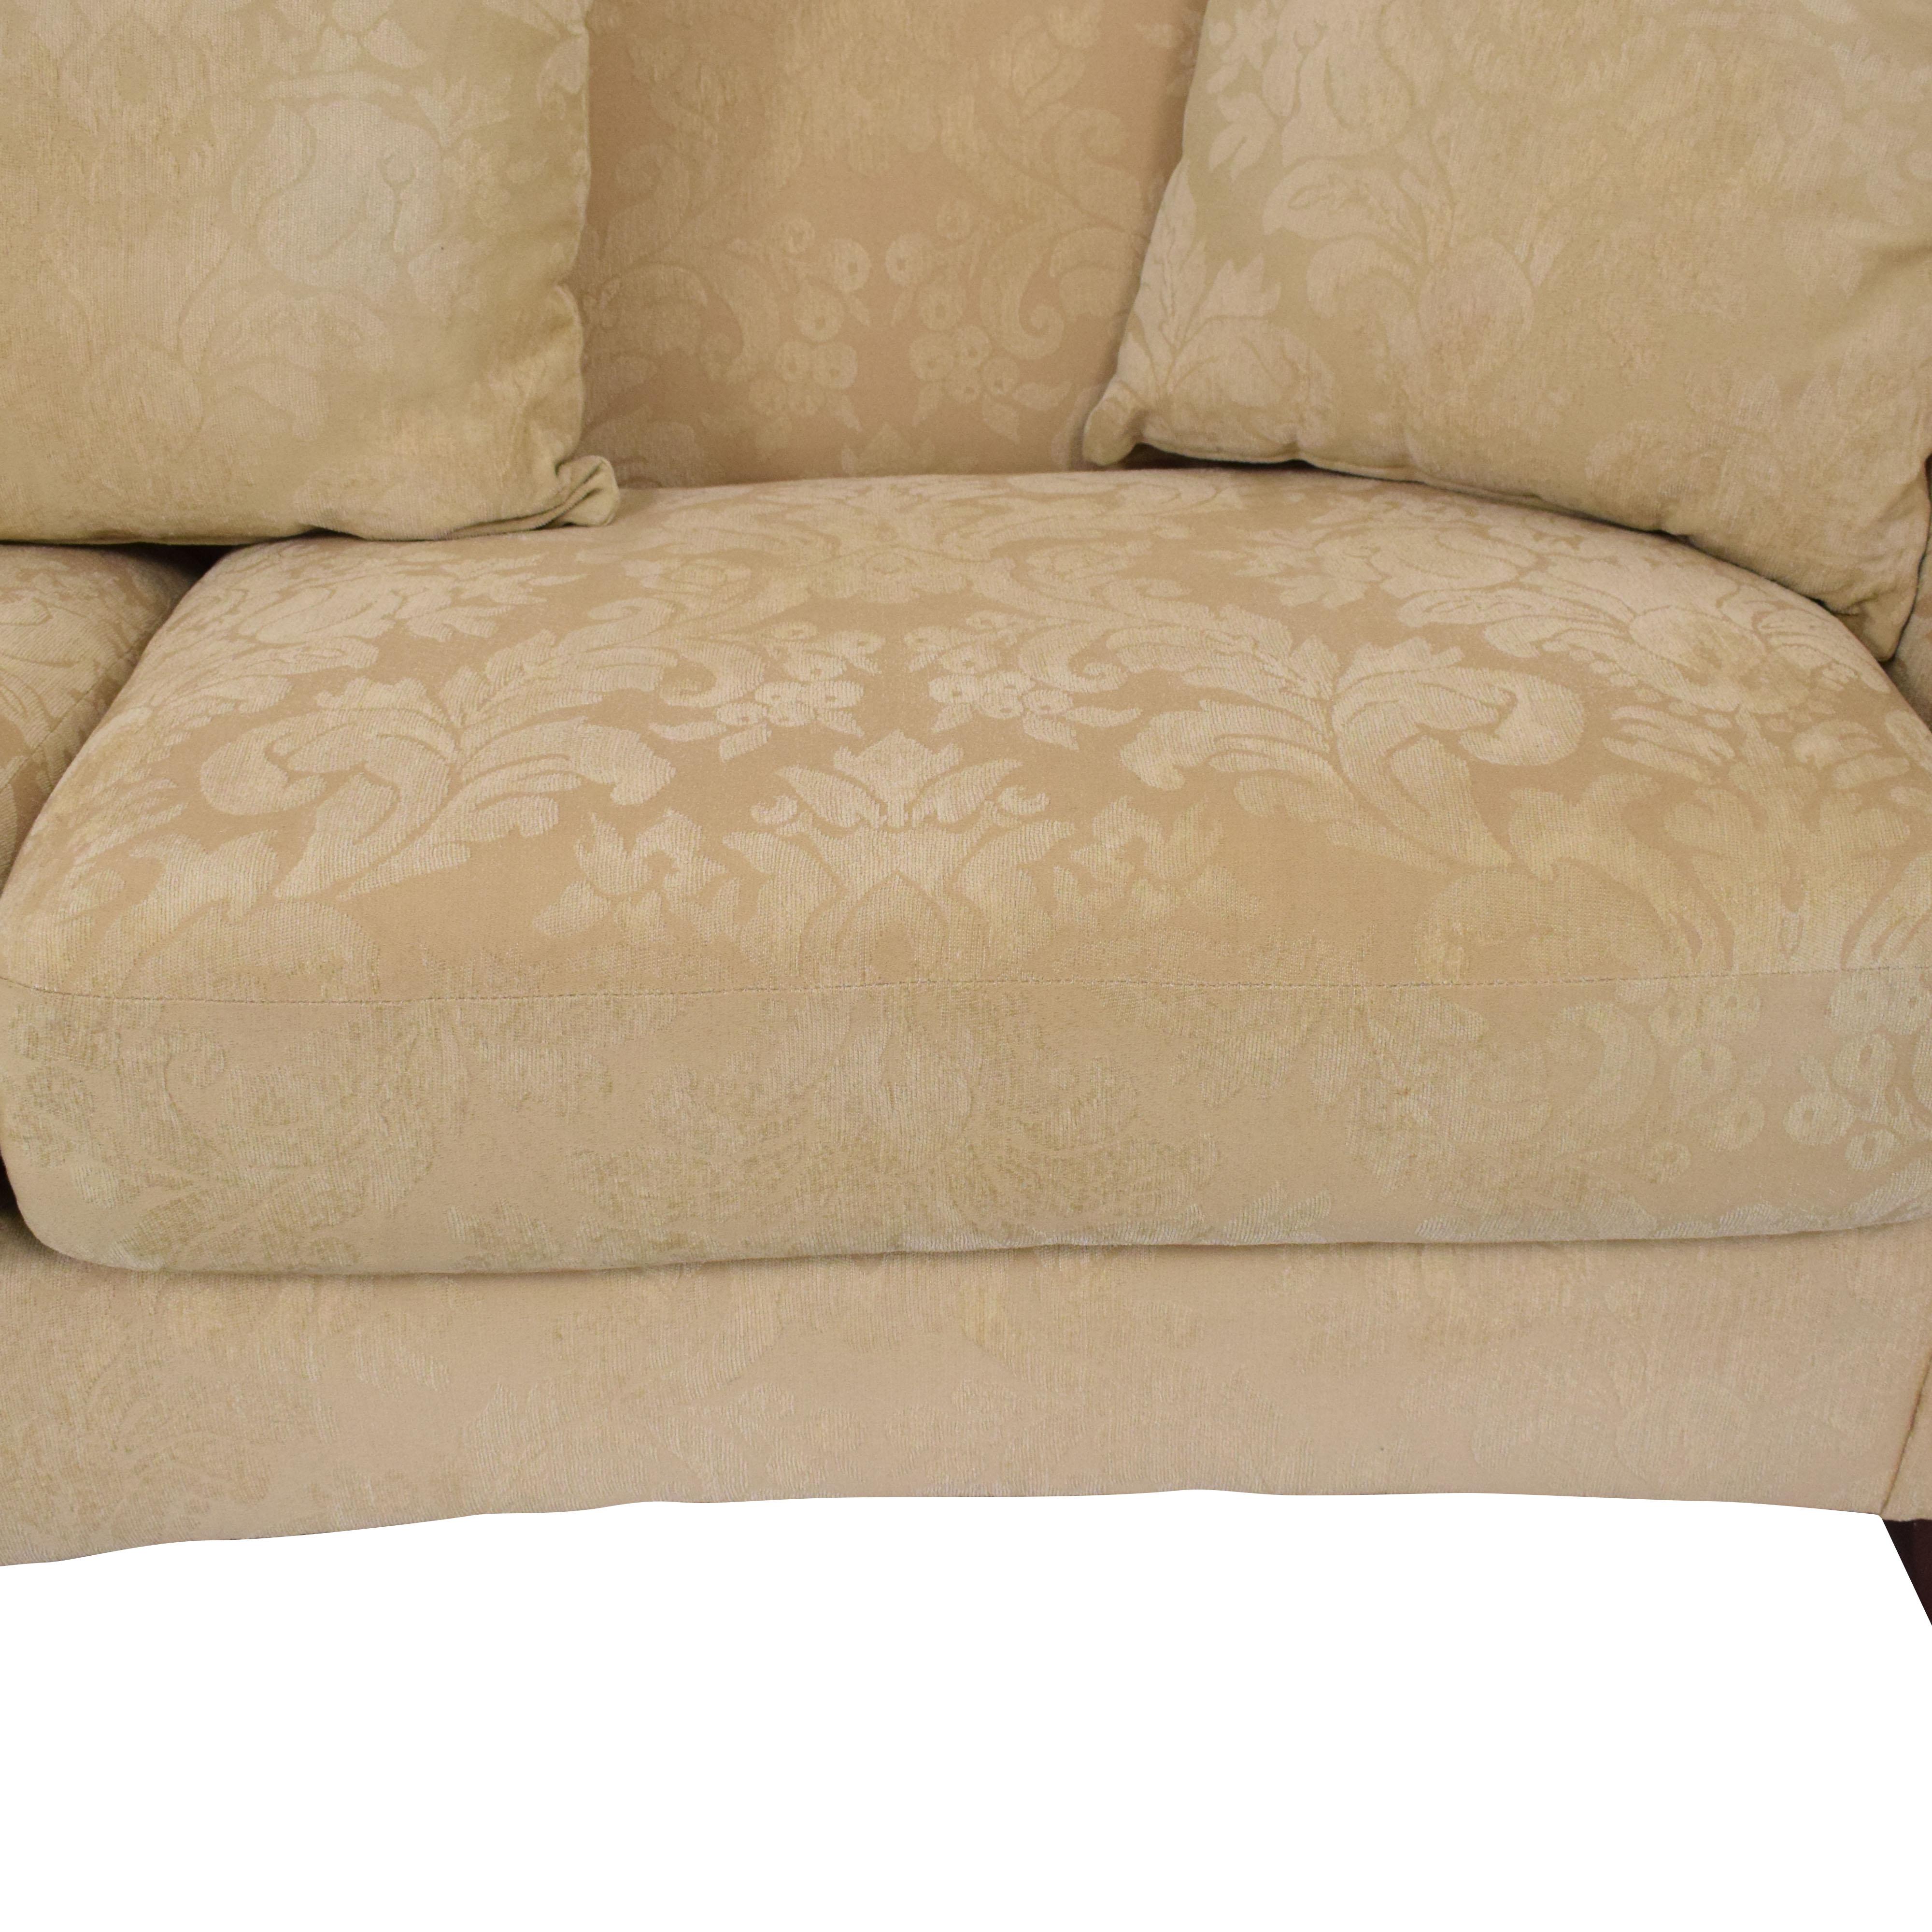 Macy's Macy's Two Cushion Sofa